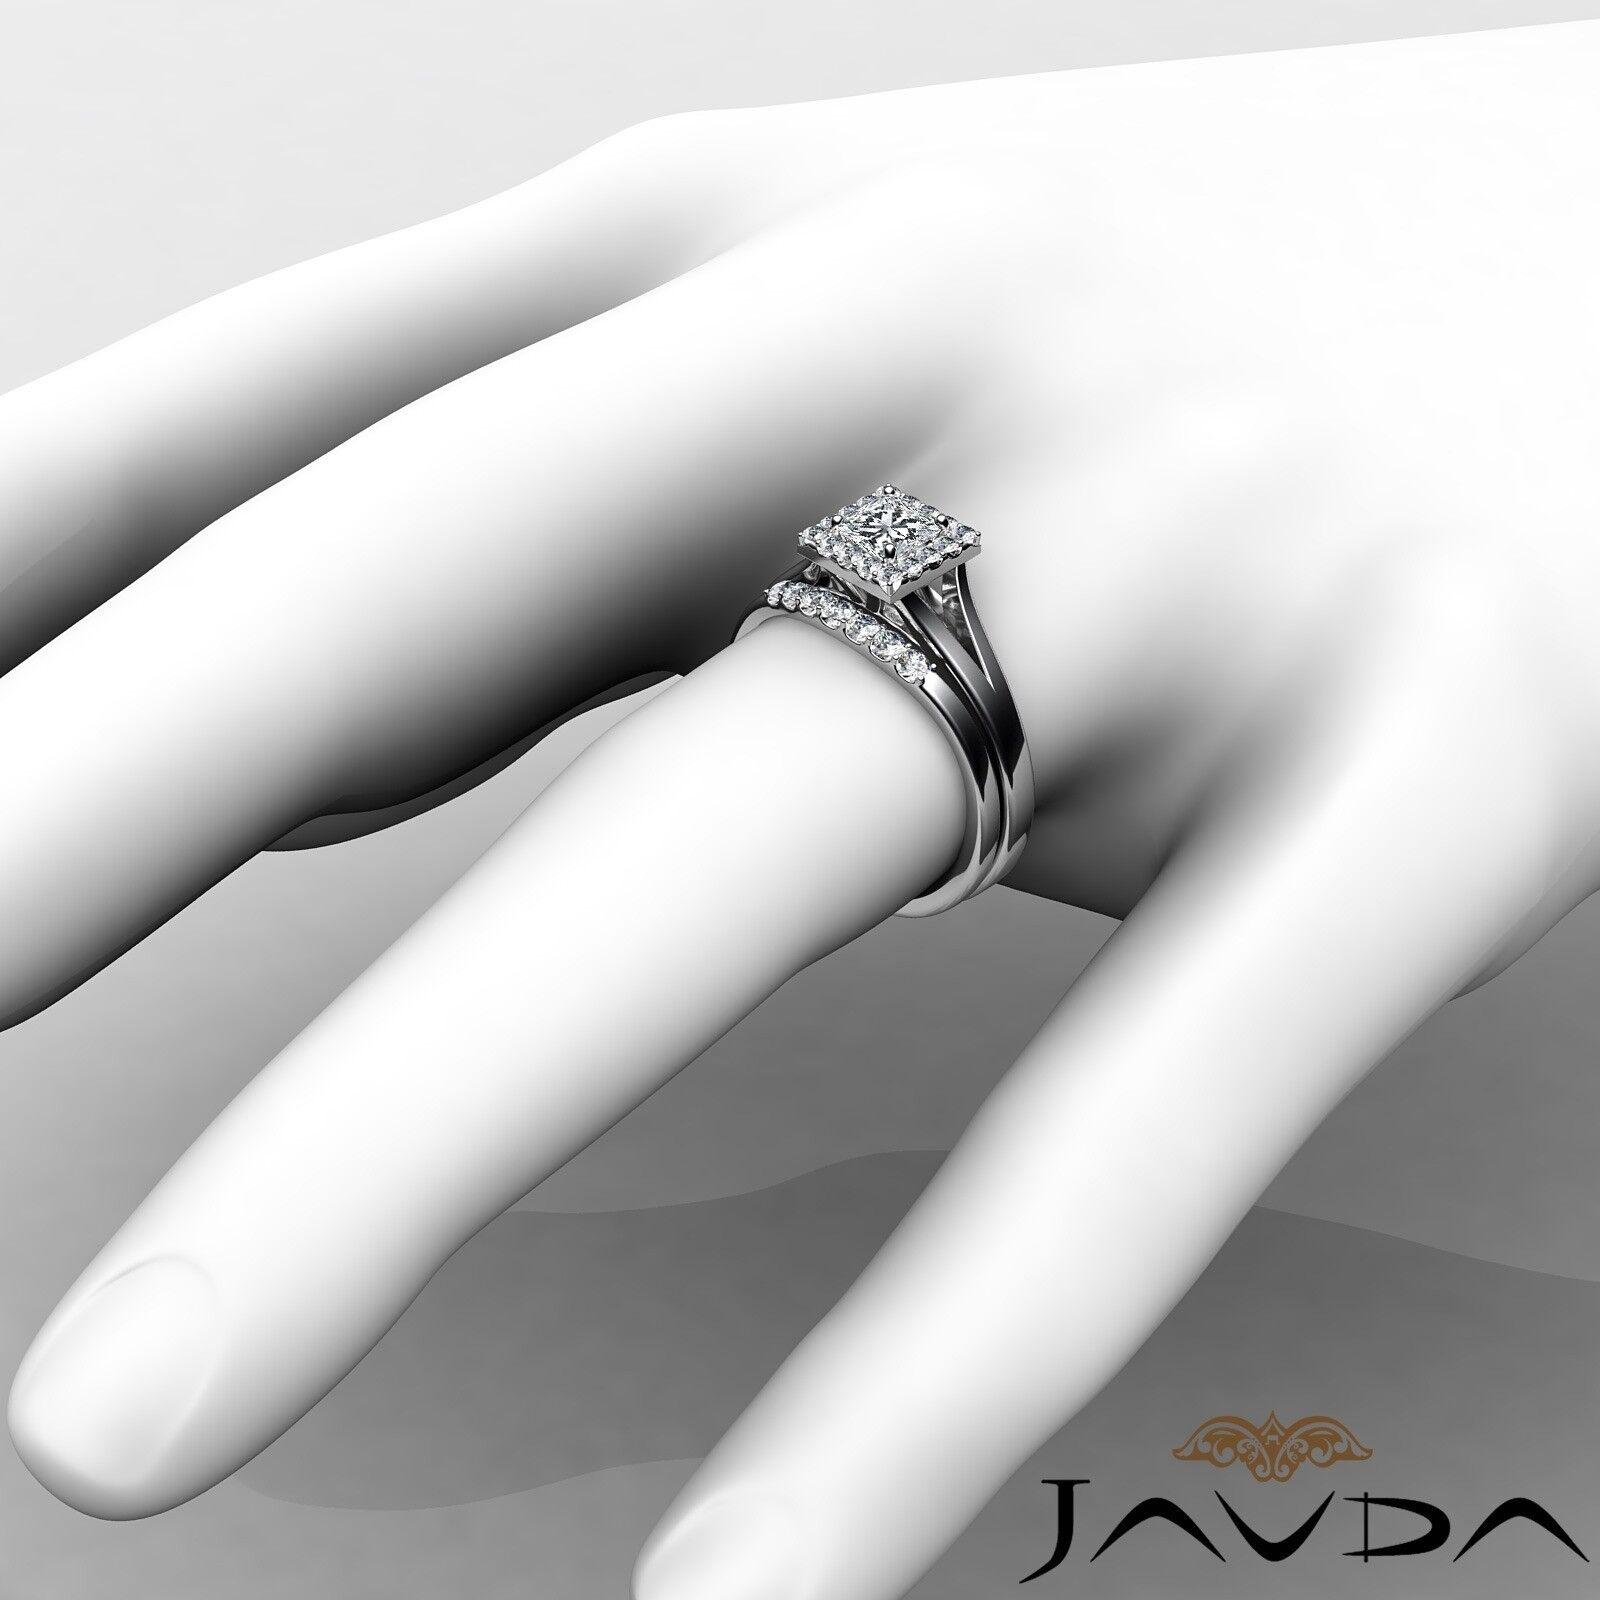 0.93ctw Halo Pave Bridal Princess Diamond Engagement Ring GIA F-VVS1 White Gold 4